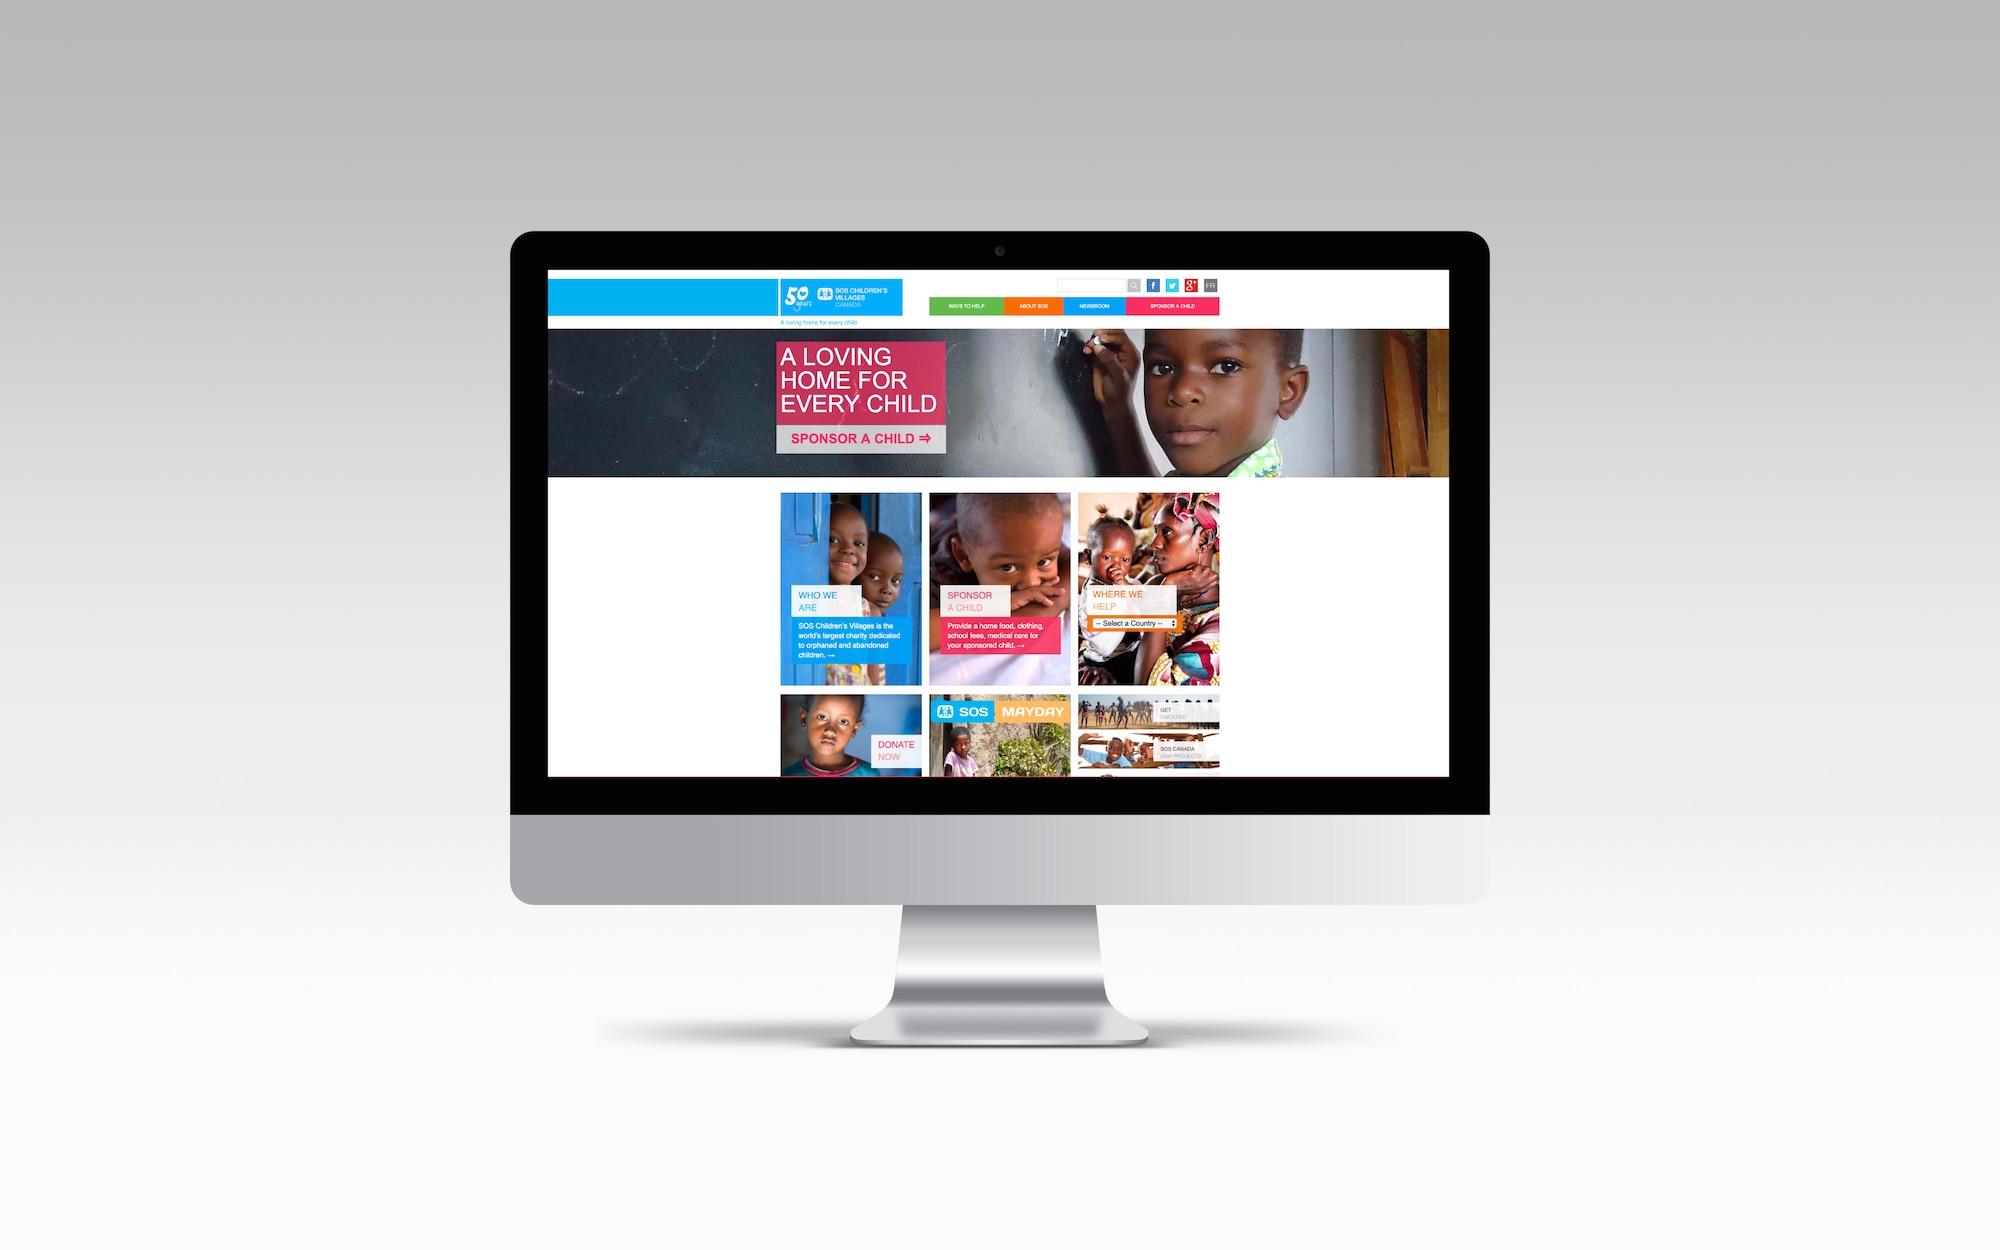 Image of SOS new website displayed on Apple desktop screen.